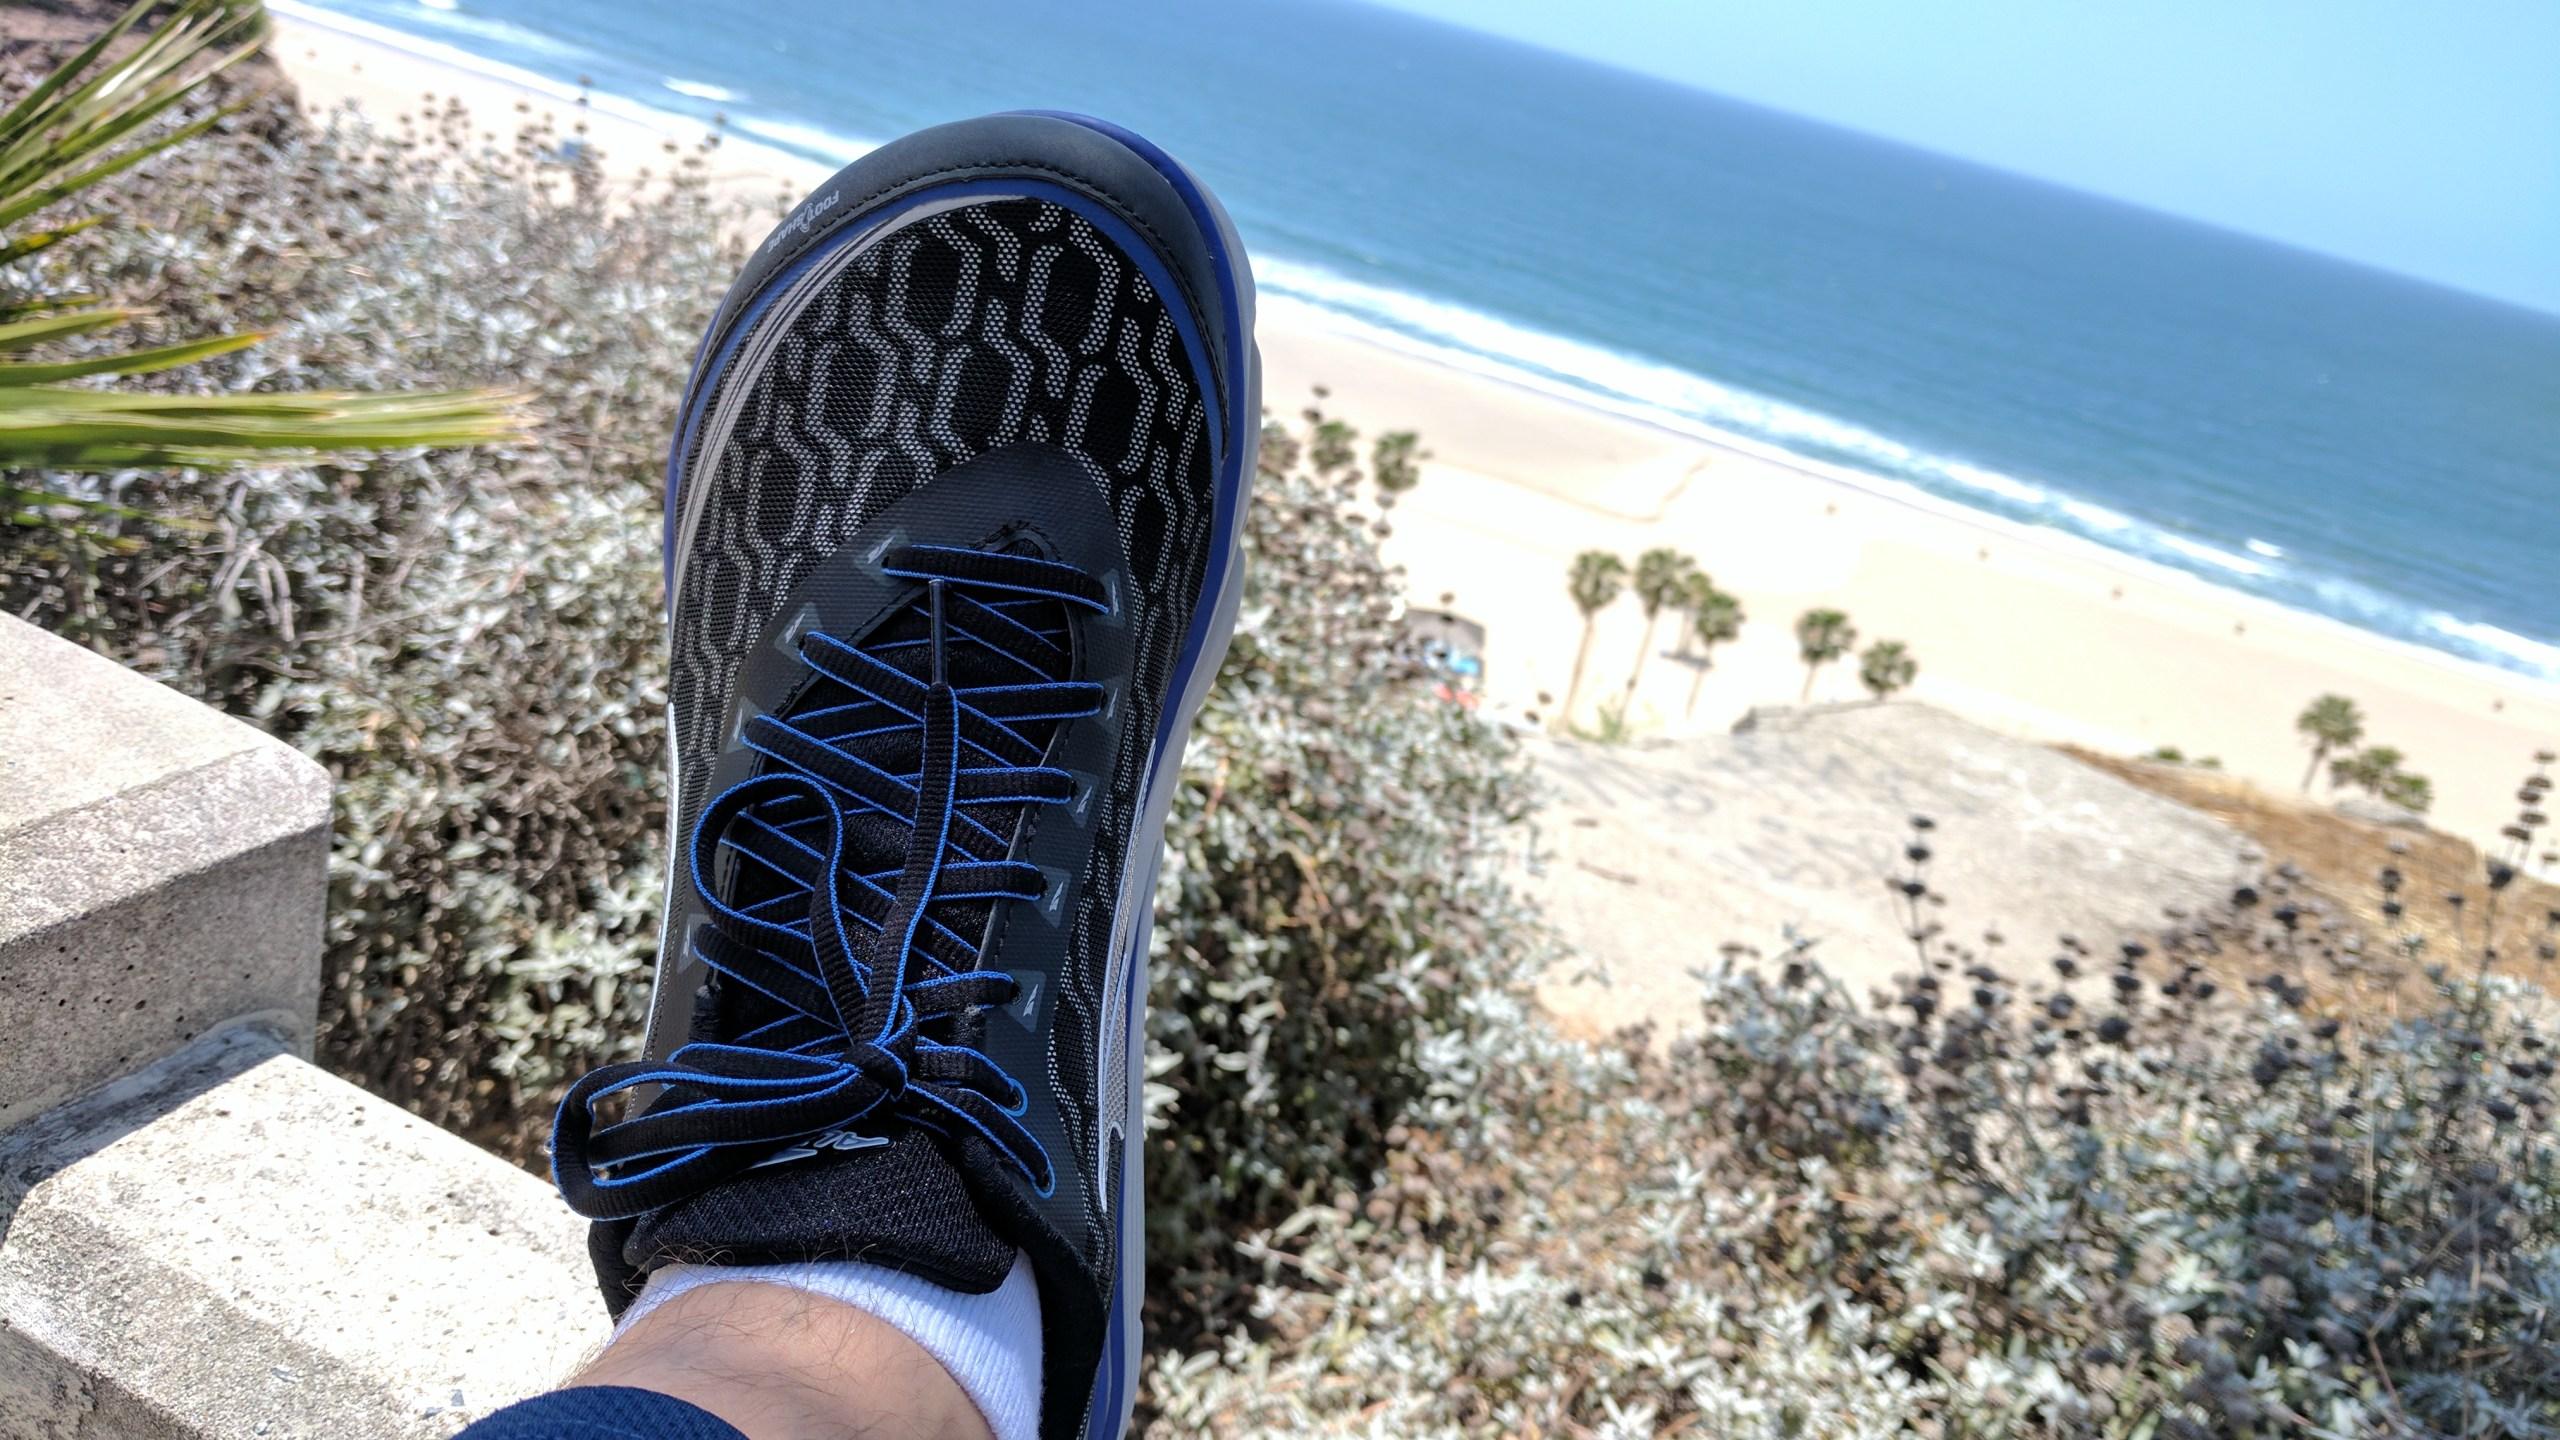 altra iq smart shoe review 2017